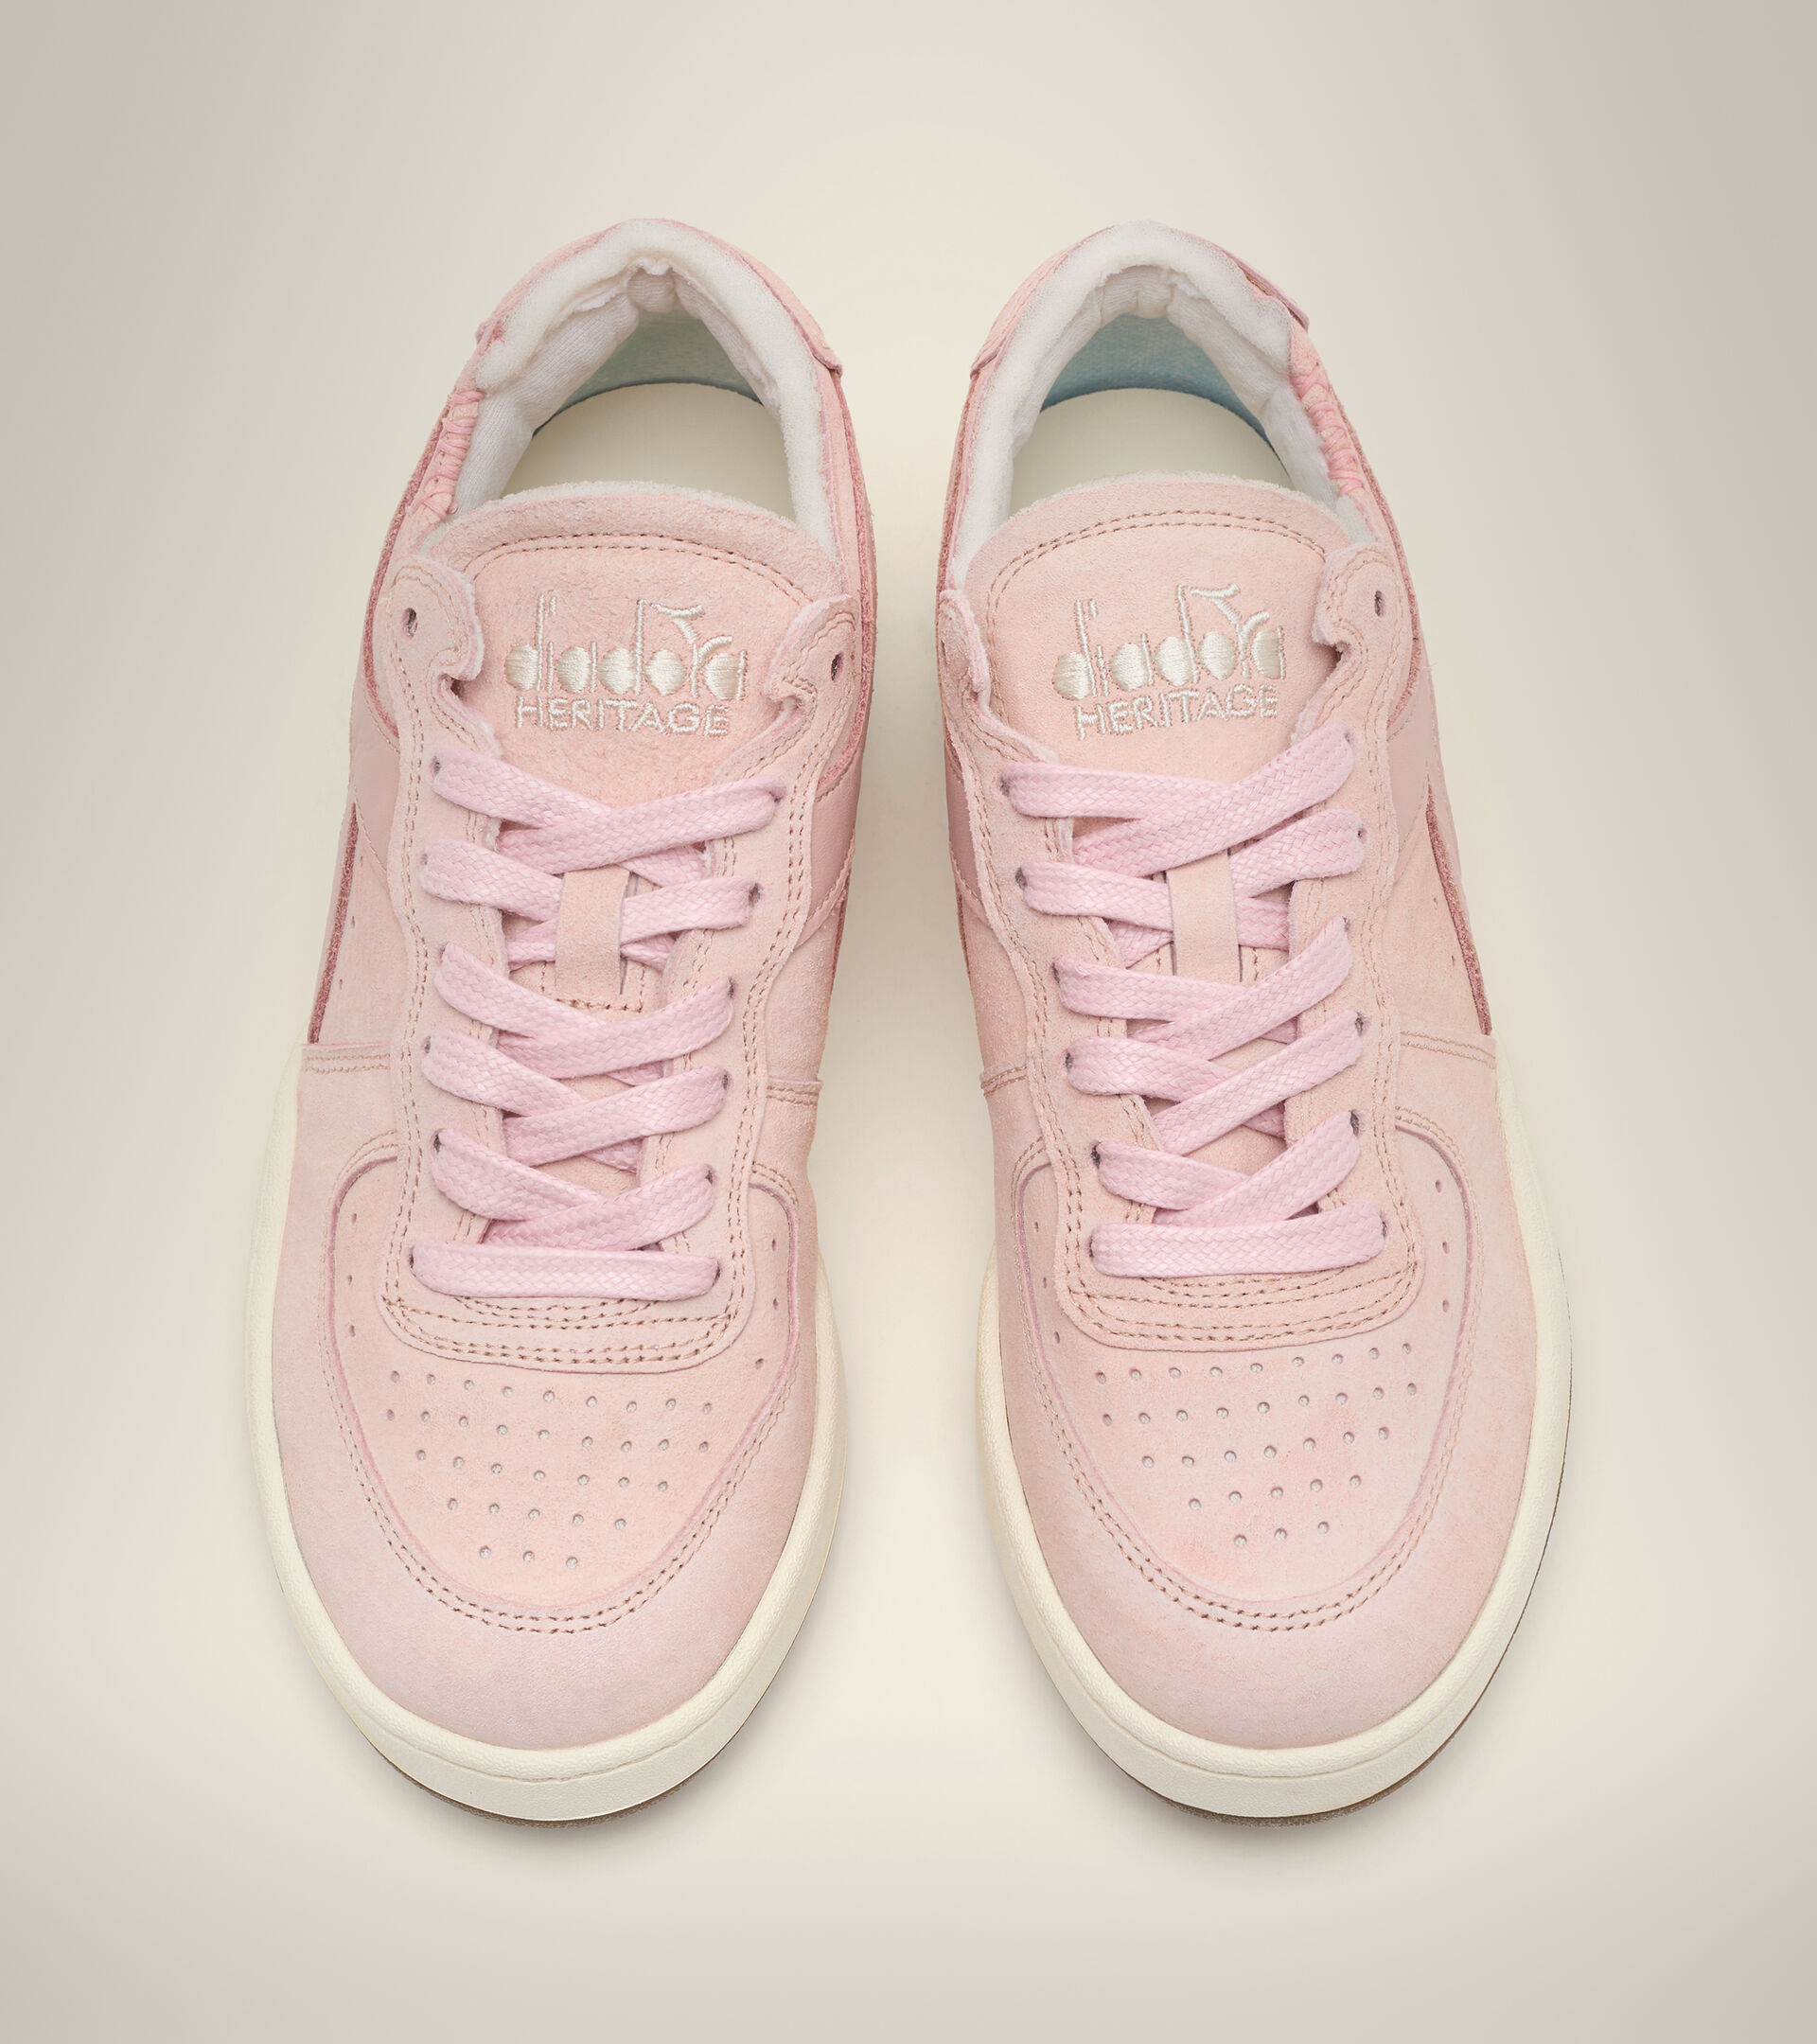 Footwear Heritage DONNA MI BASKET ROW CUT SUEDE USED WN PINK POWDER Diadora